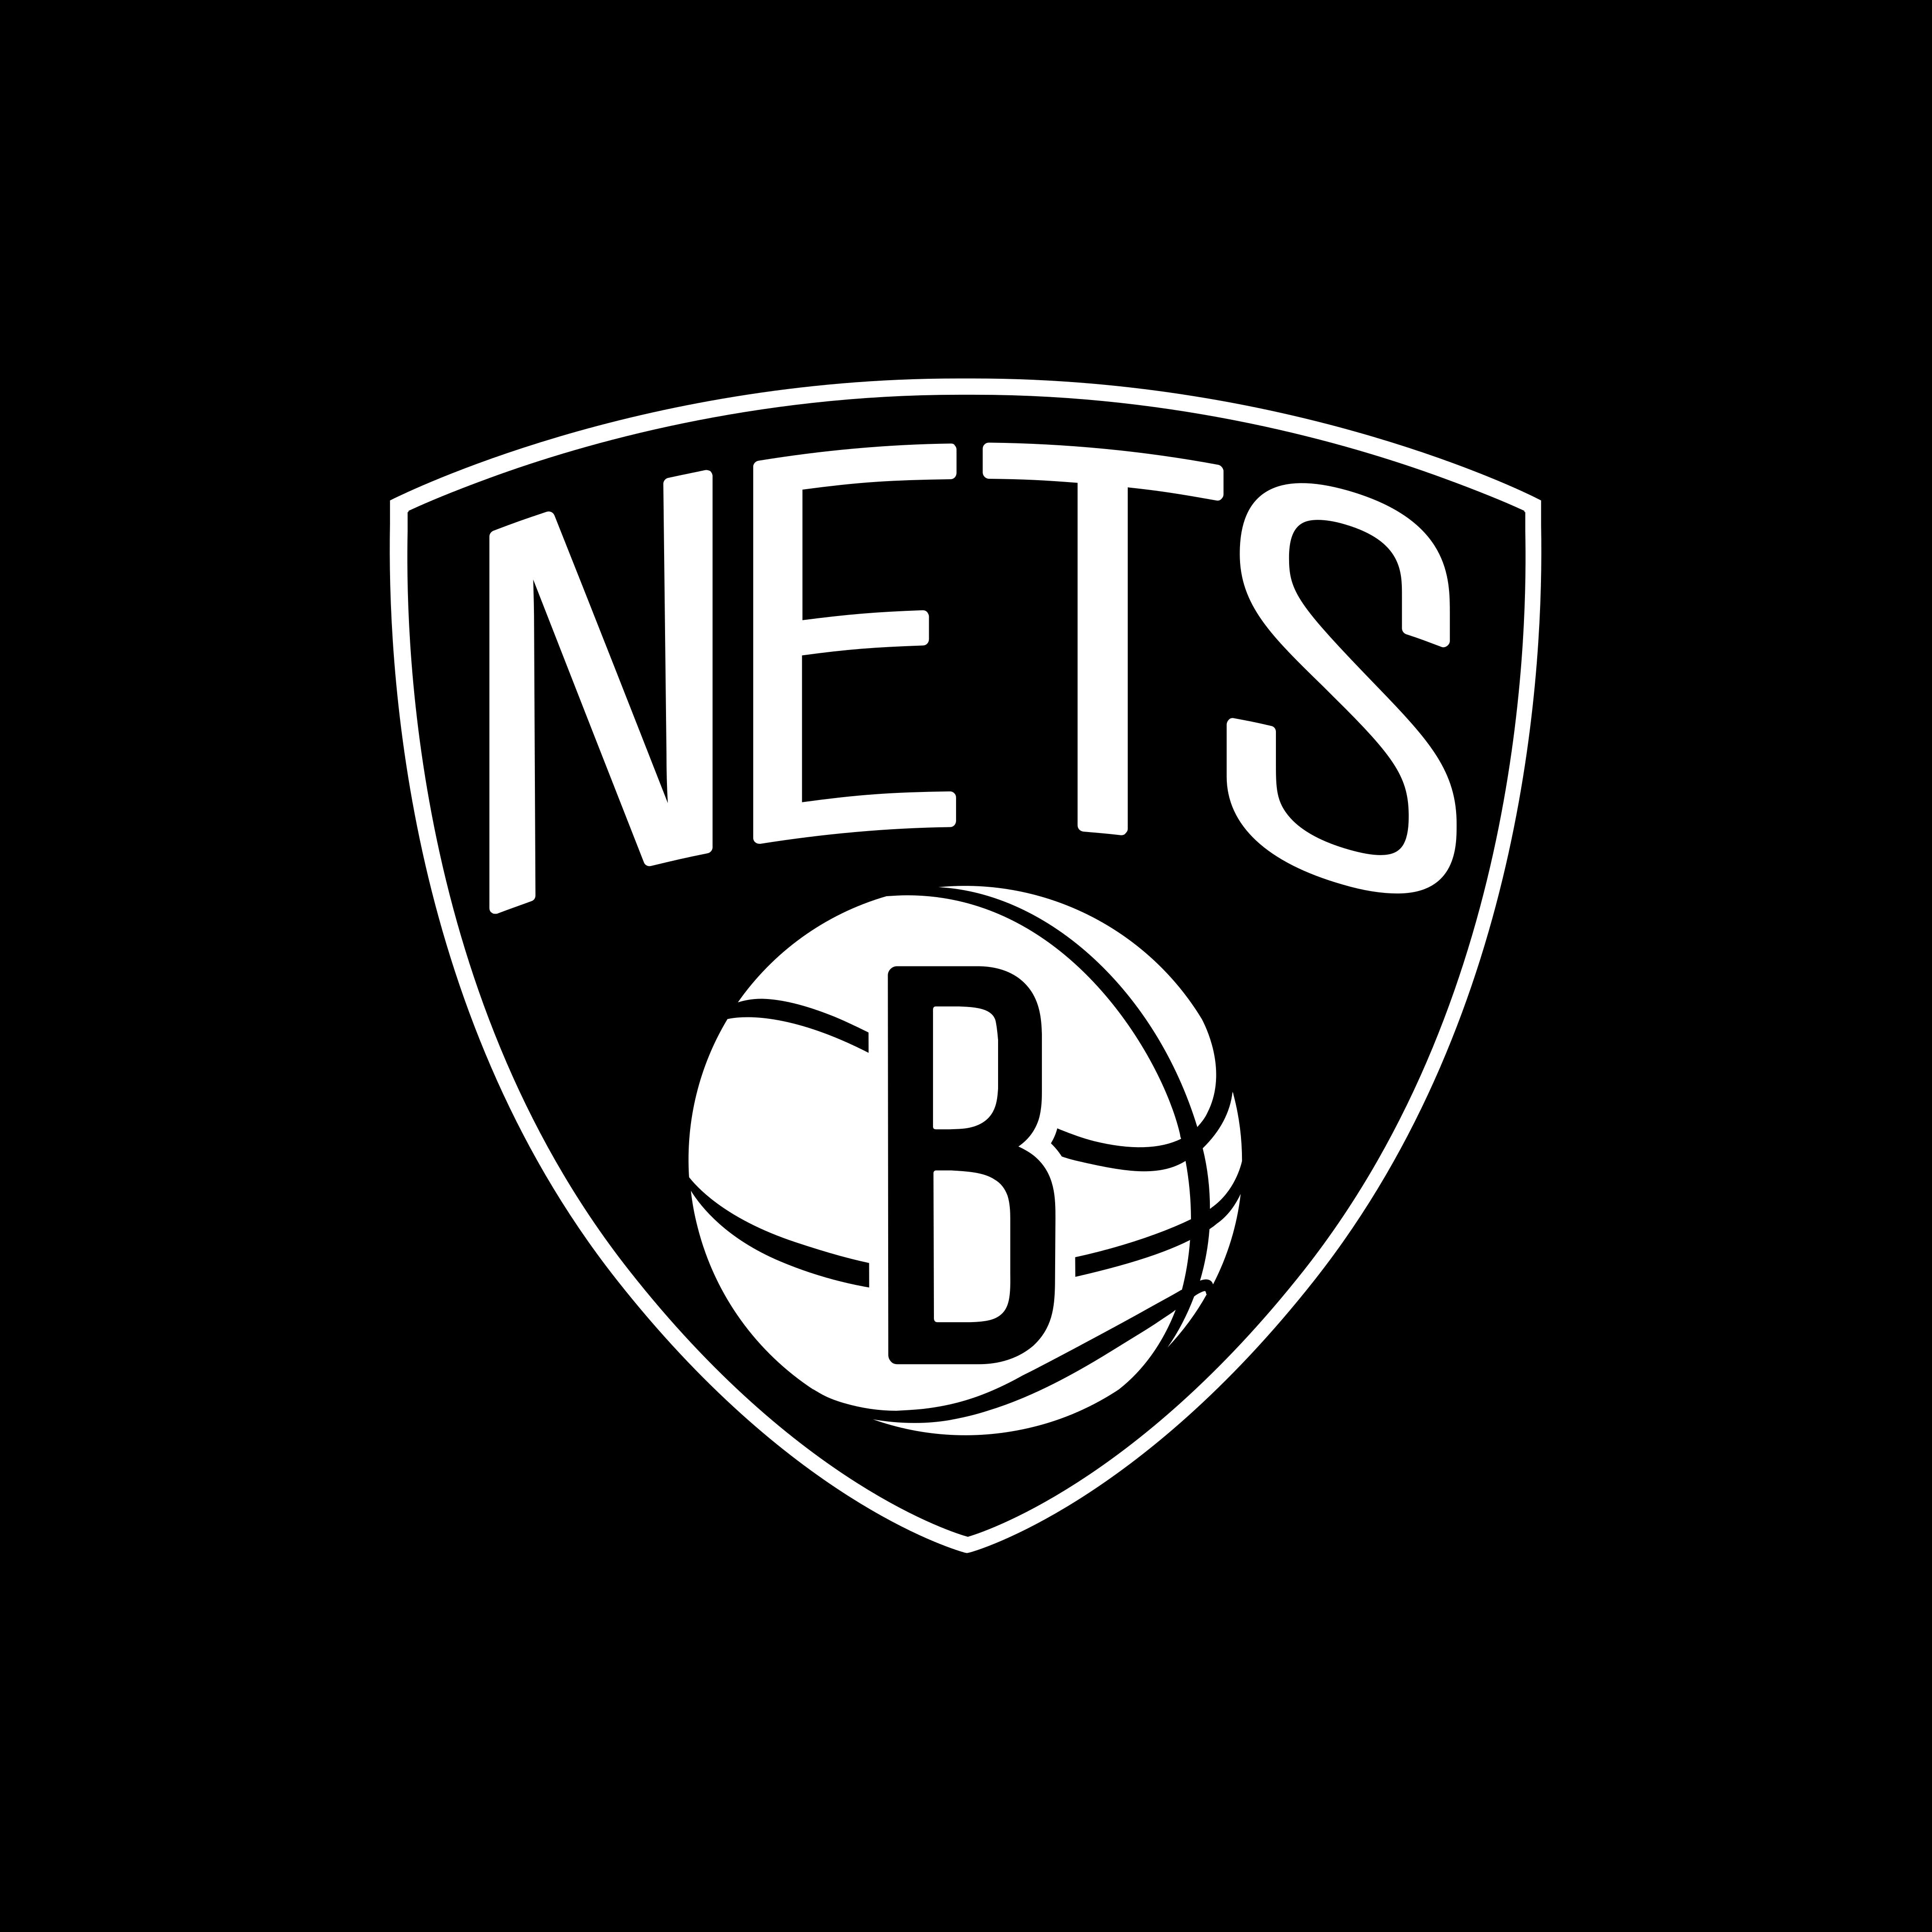 brooklyn nets logo 0 - Brooklyn Nets Logo